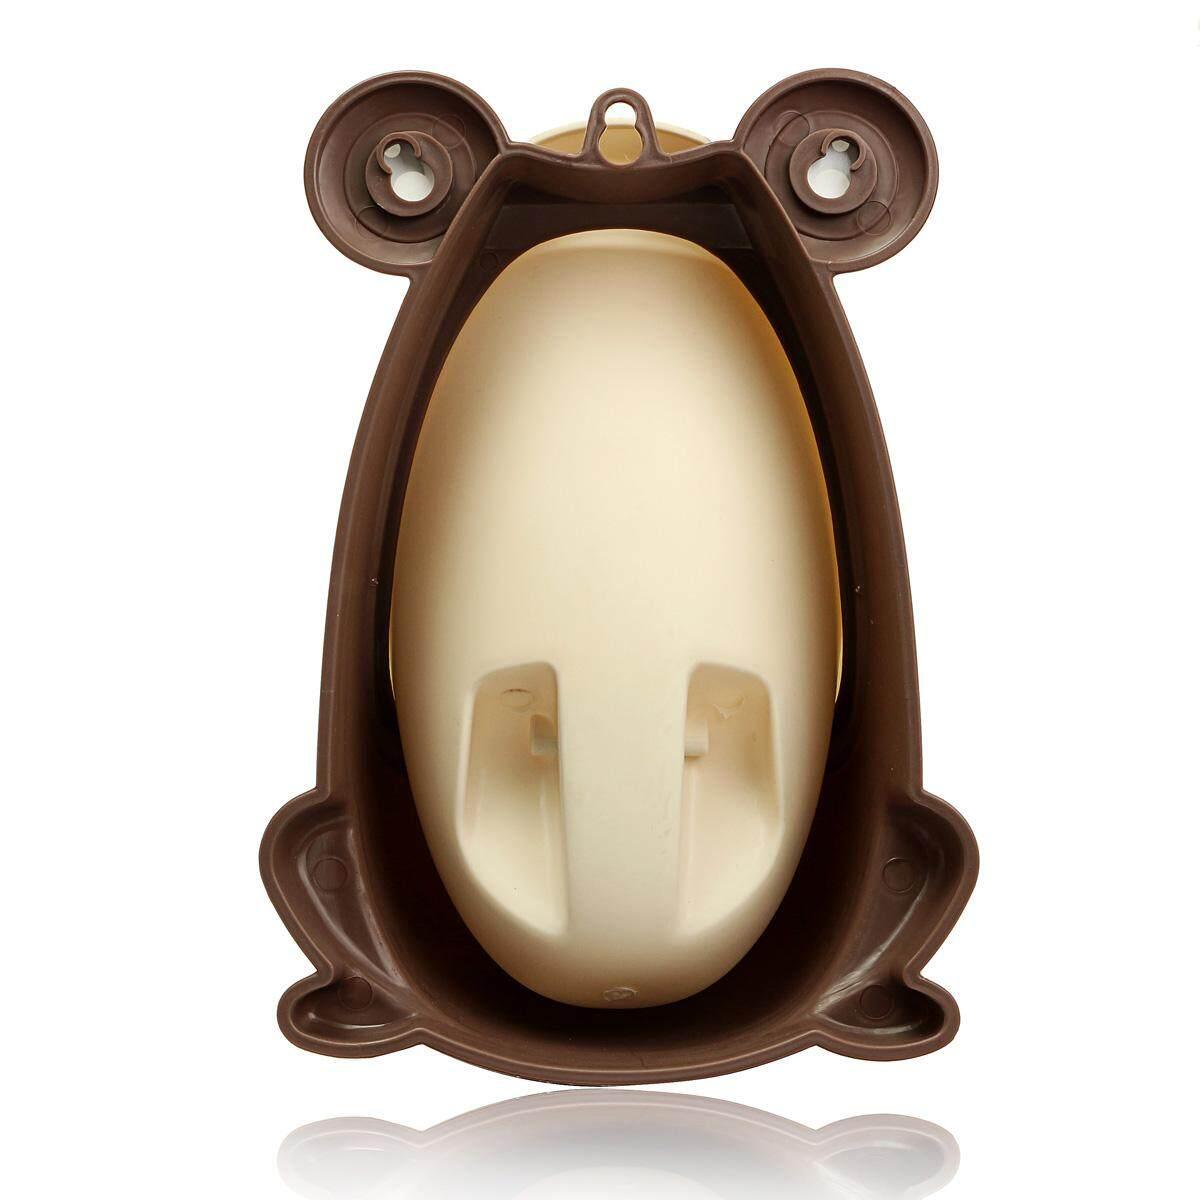 Children Toddler Kid Baby Boy Frog Potty Urinal Pee Toilet Bathroom Trainingcoffee By Moonbeam.